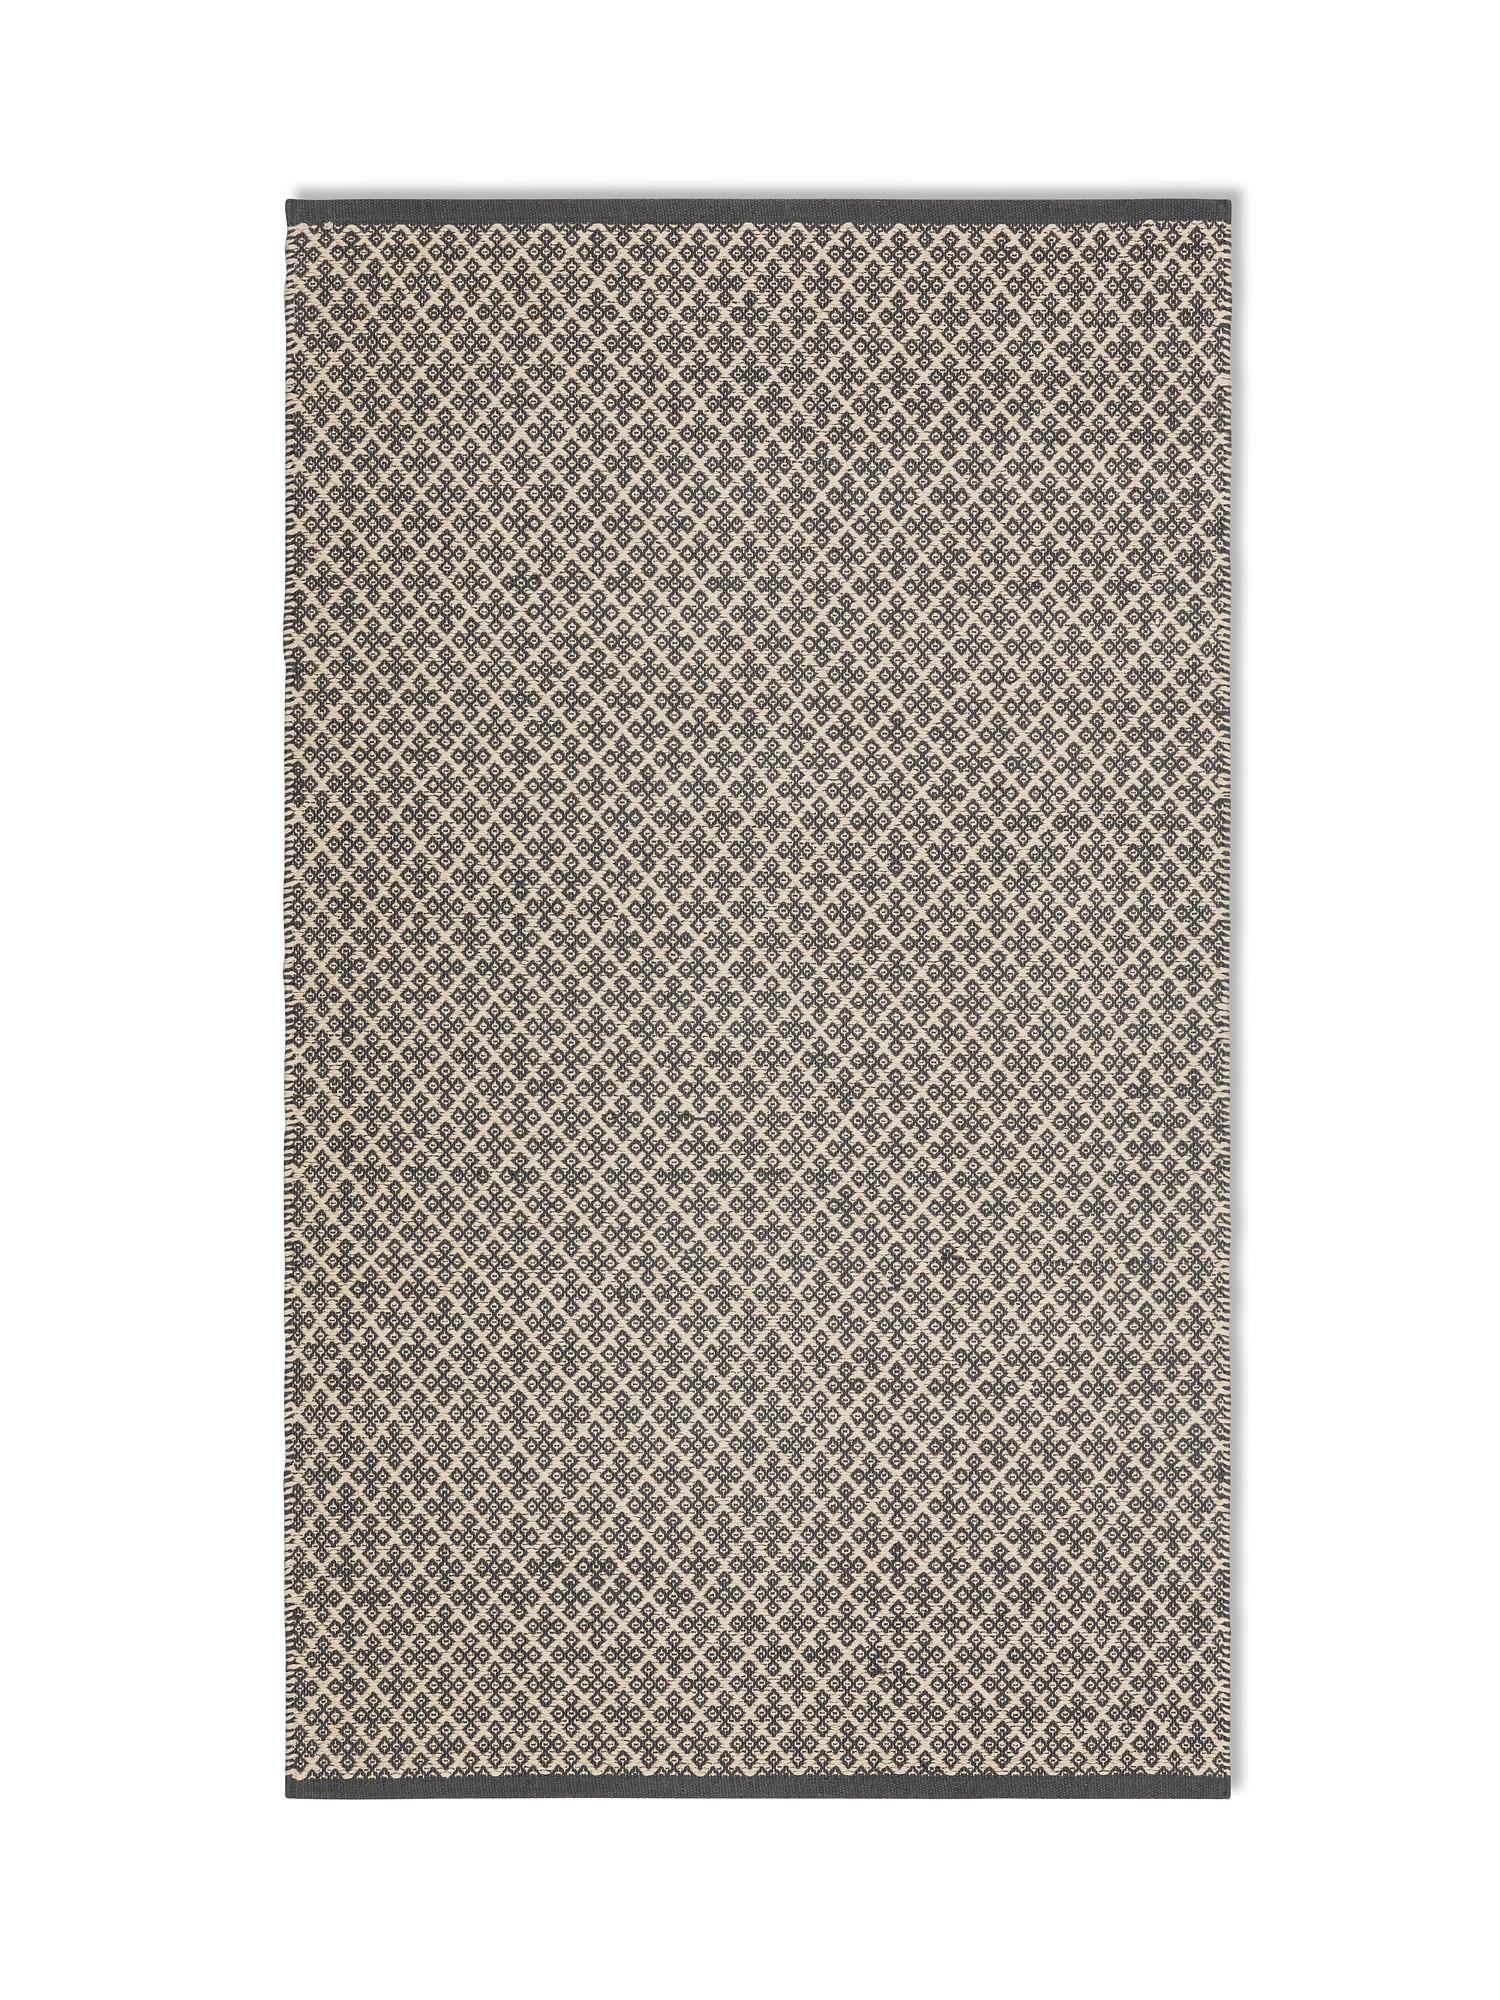 Tappeto tessuto a mano motivo geometrico, Grigio, large image number 0